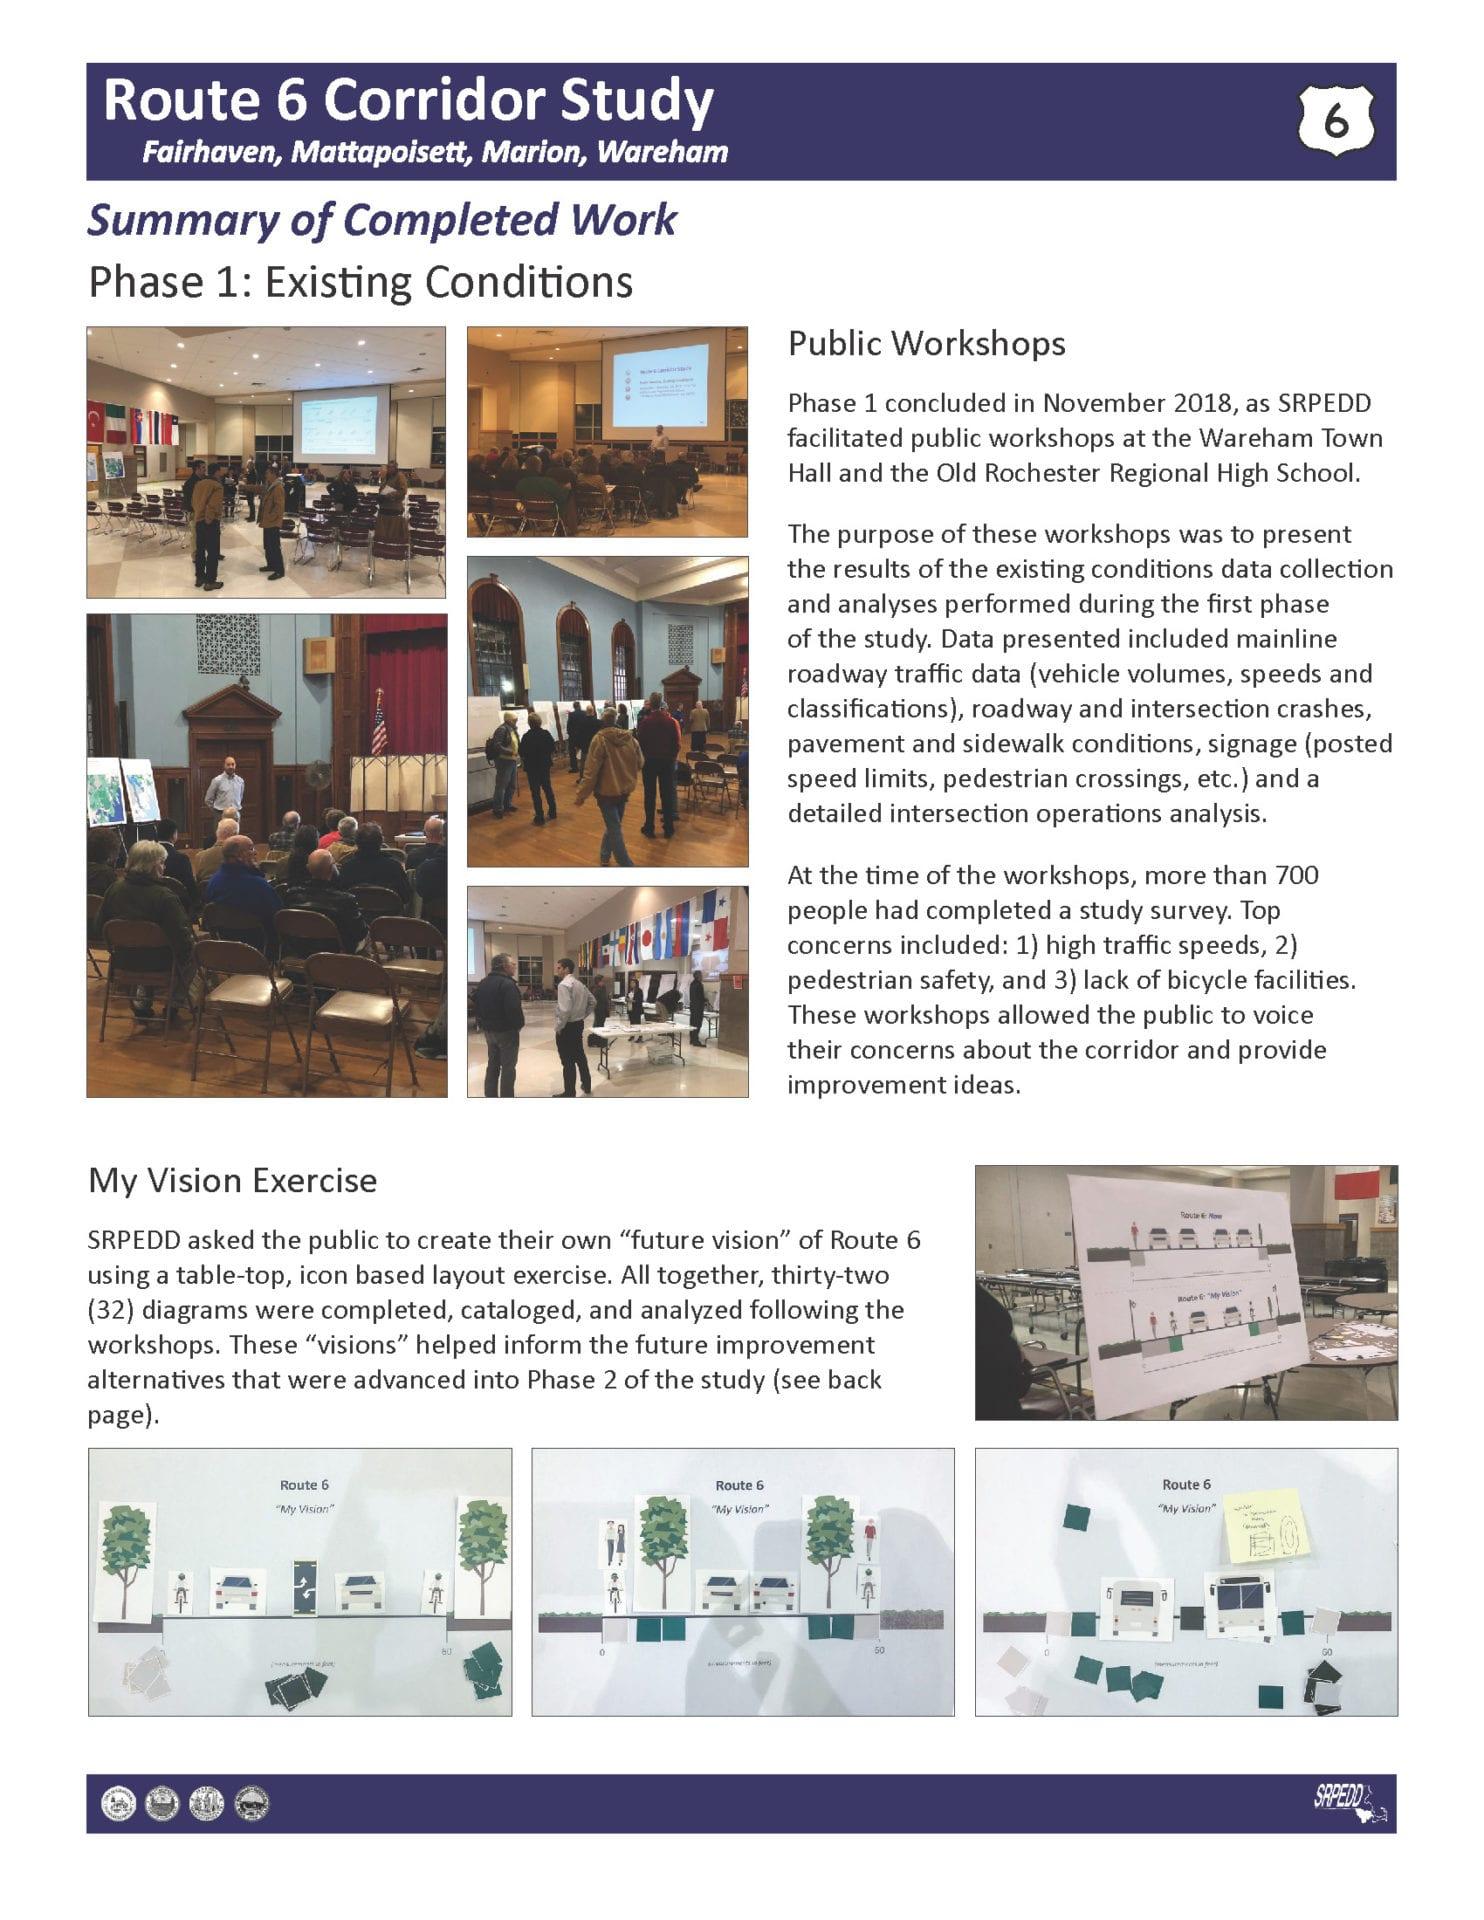 Route 6 Corridor Study Recap Summary